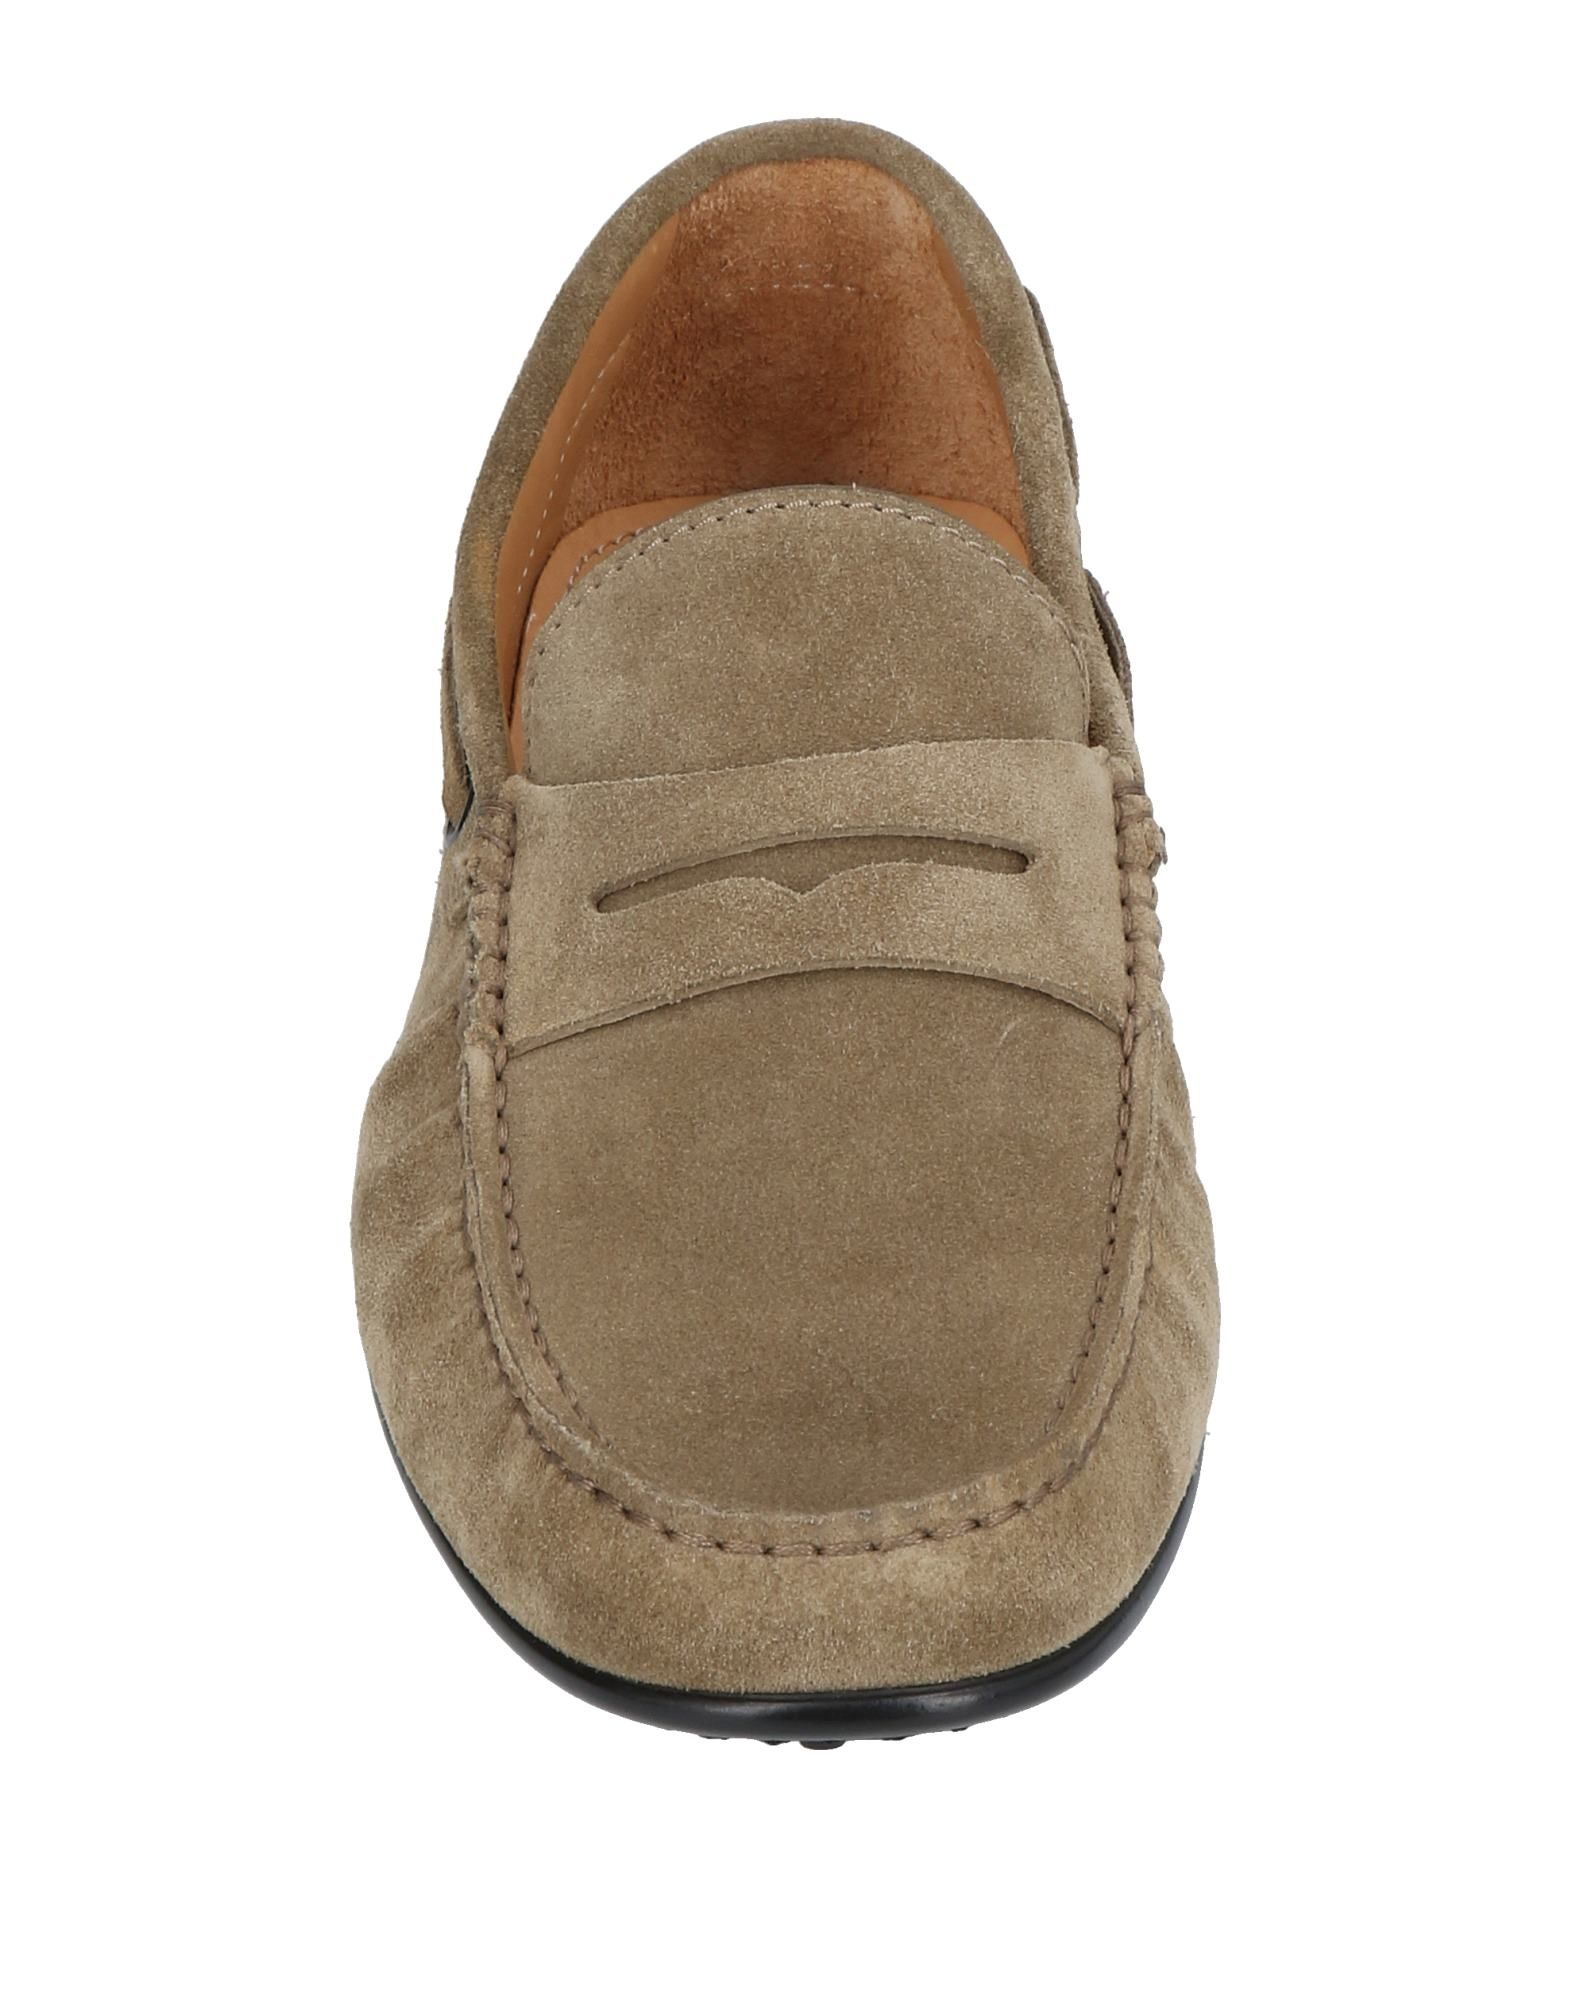 Rabatt echte Mokassins Schuhe Baccaglini Mokassins echte Herren  11464997JP 45bfeb